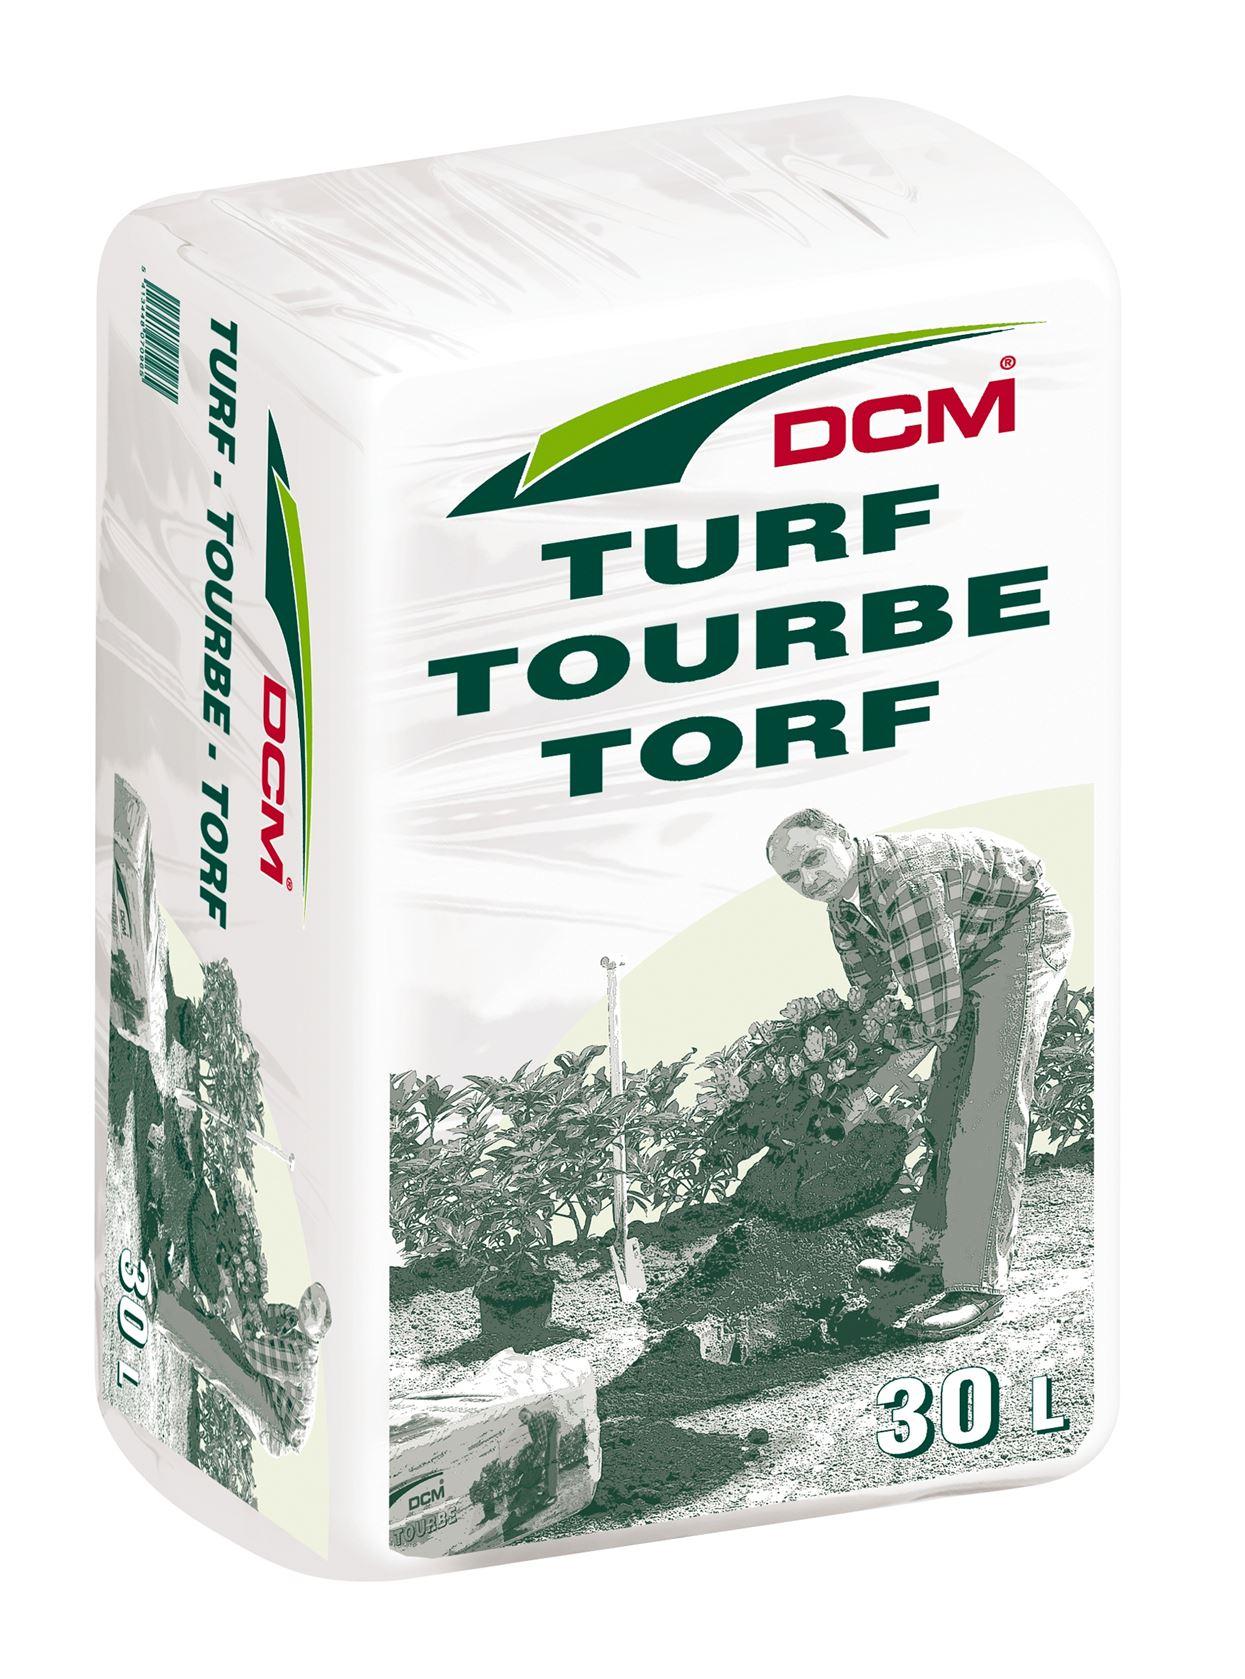 Turf 30L - Bio zuiver veen bodemverbeteraar